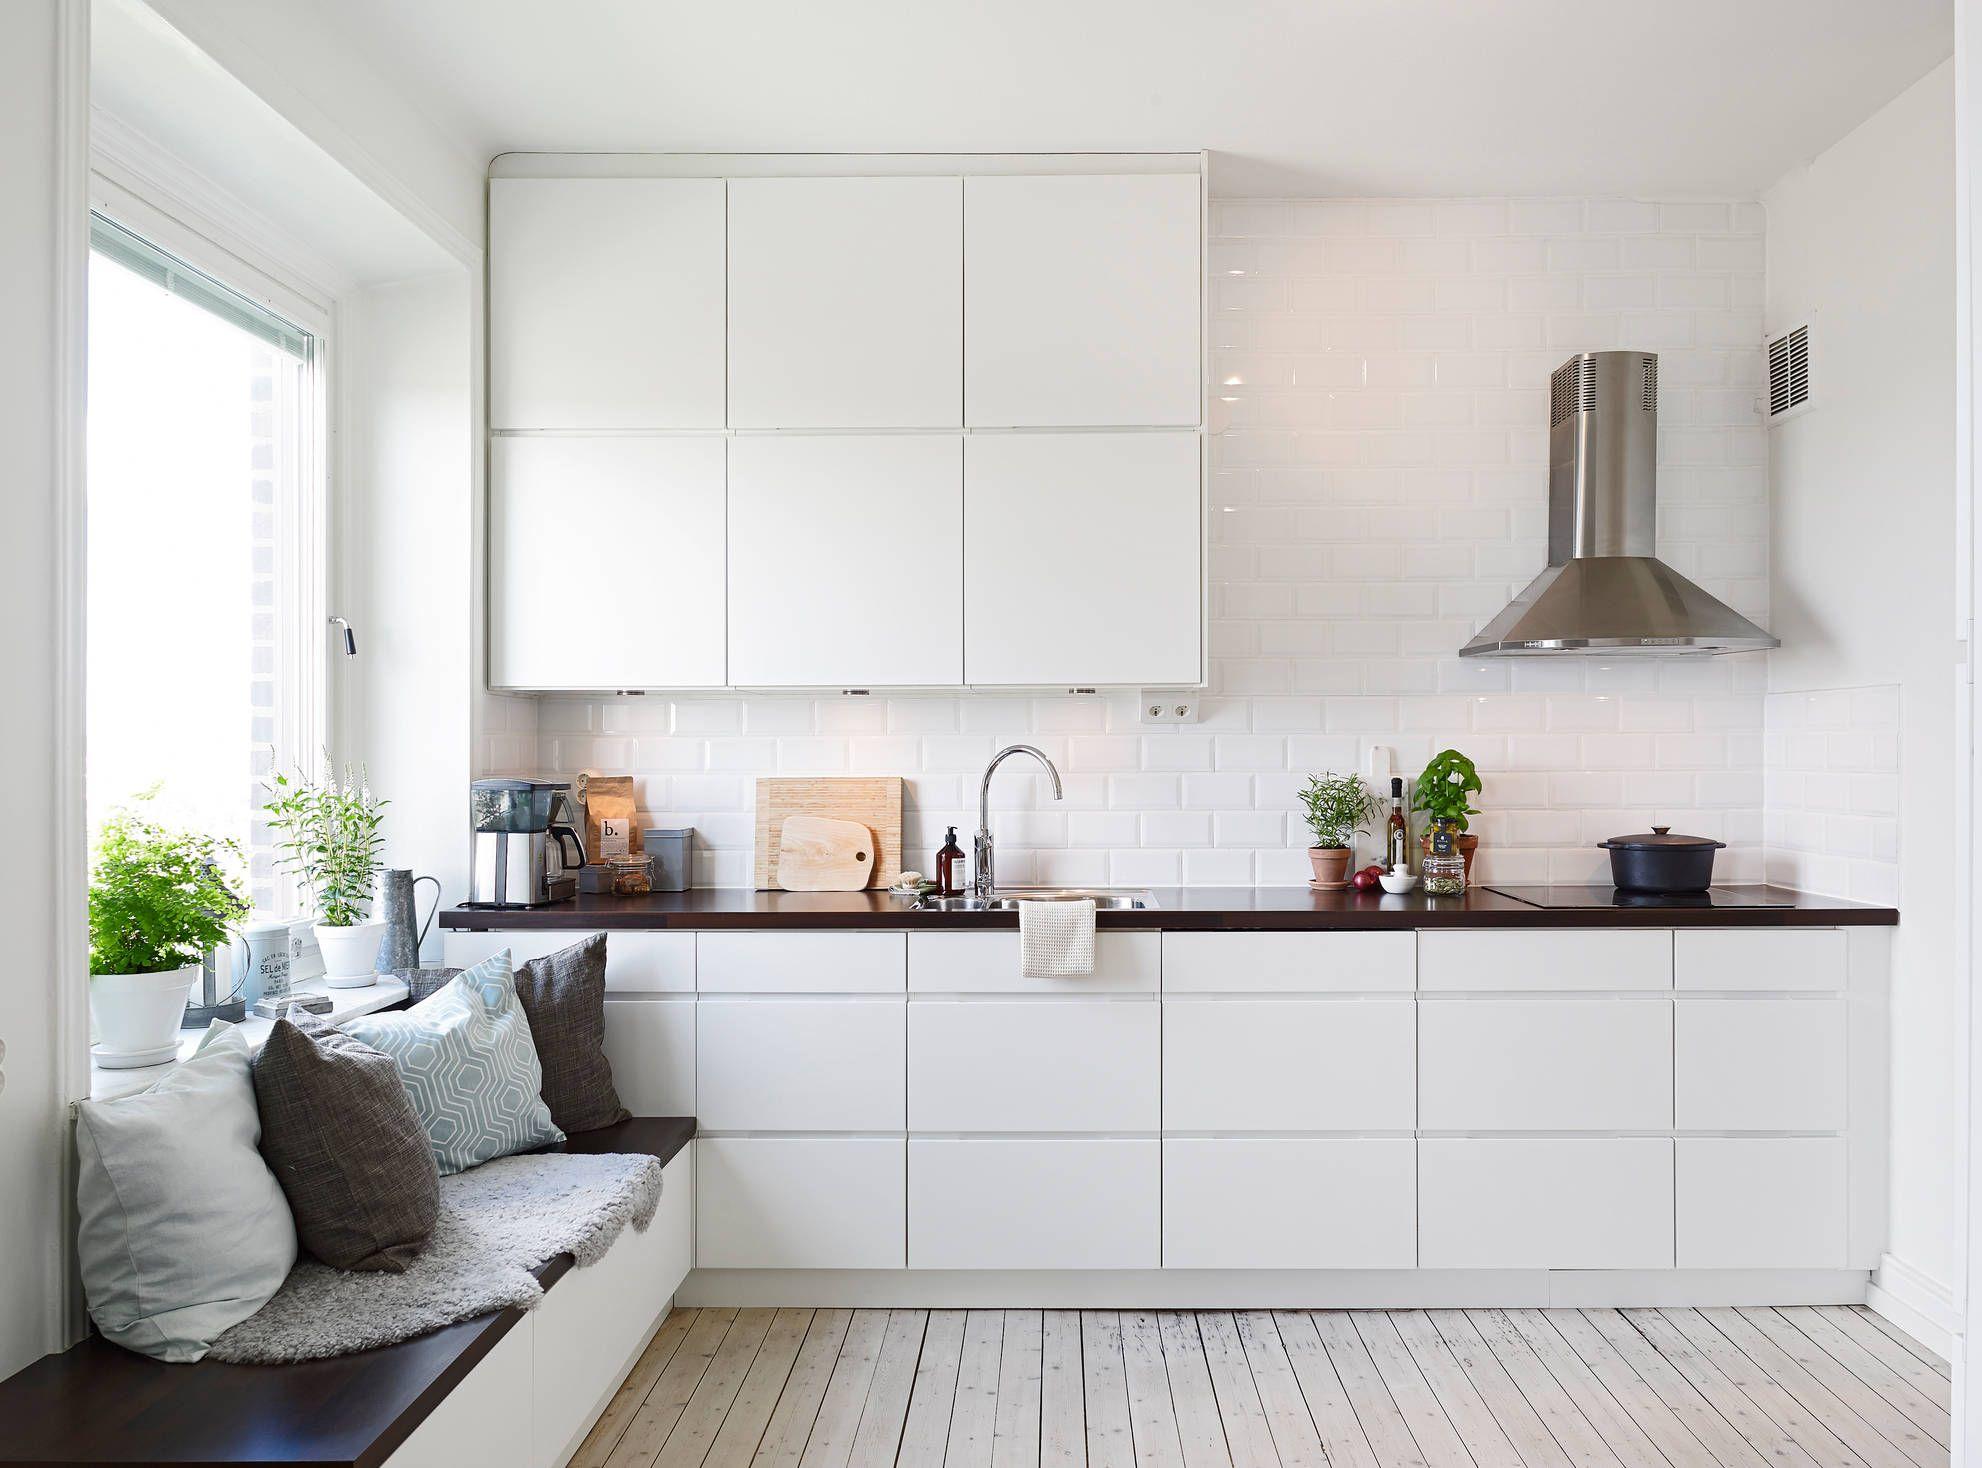 white sleek kitchen, subway tiles   New kitchen   Pinterest ...